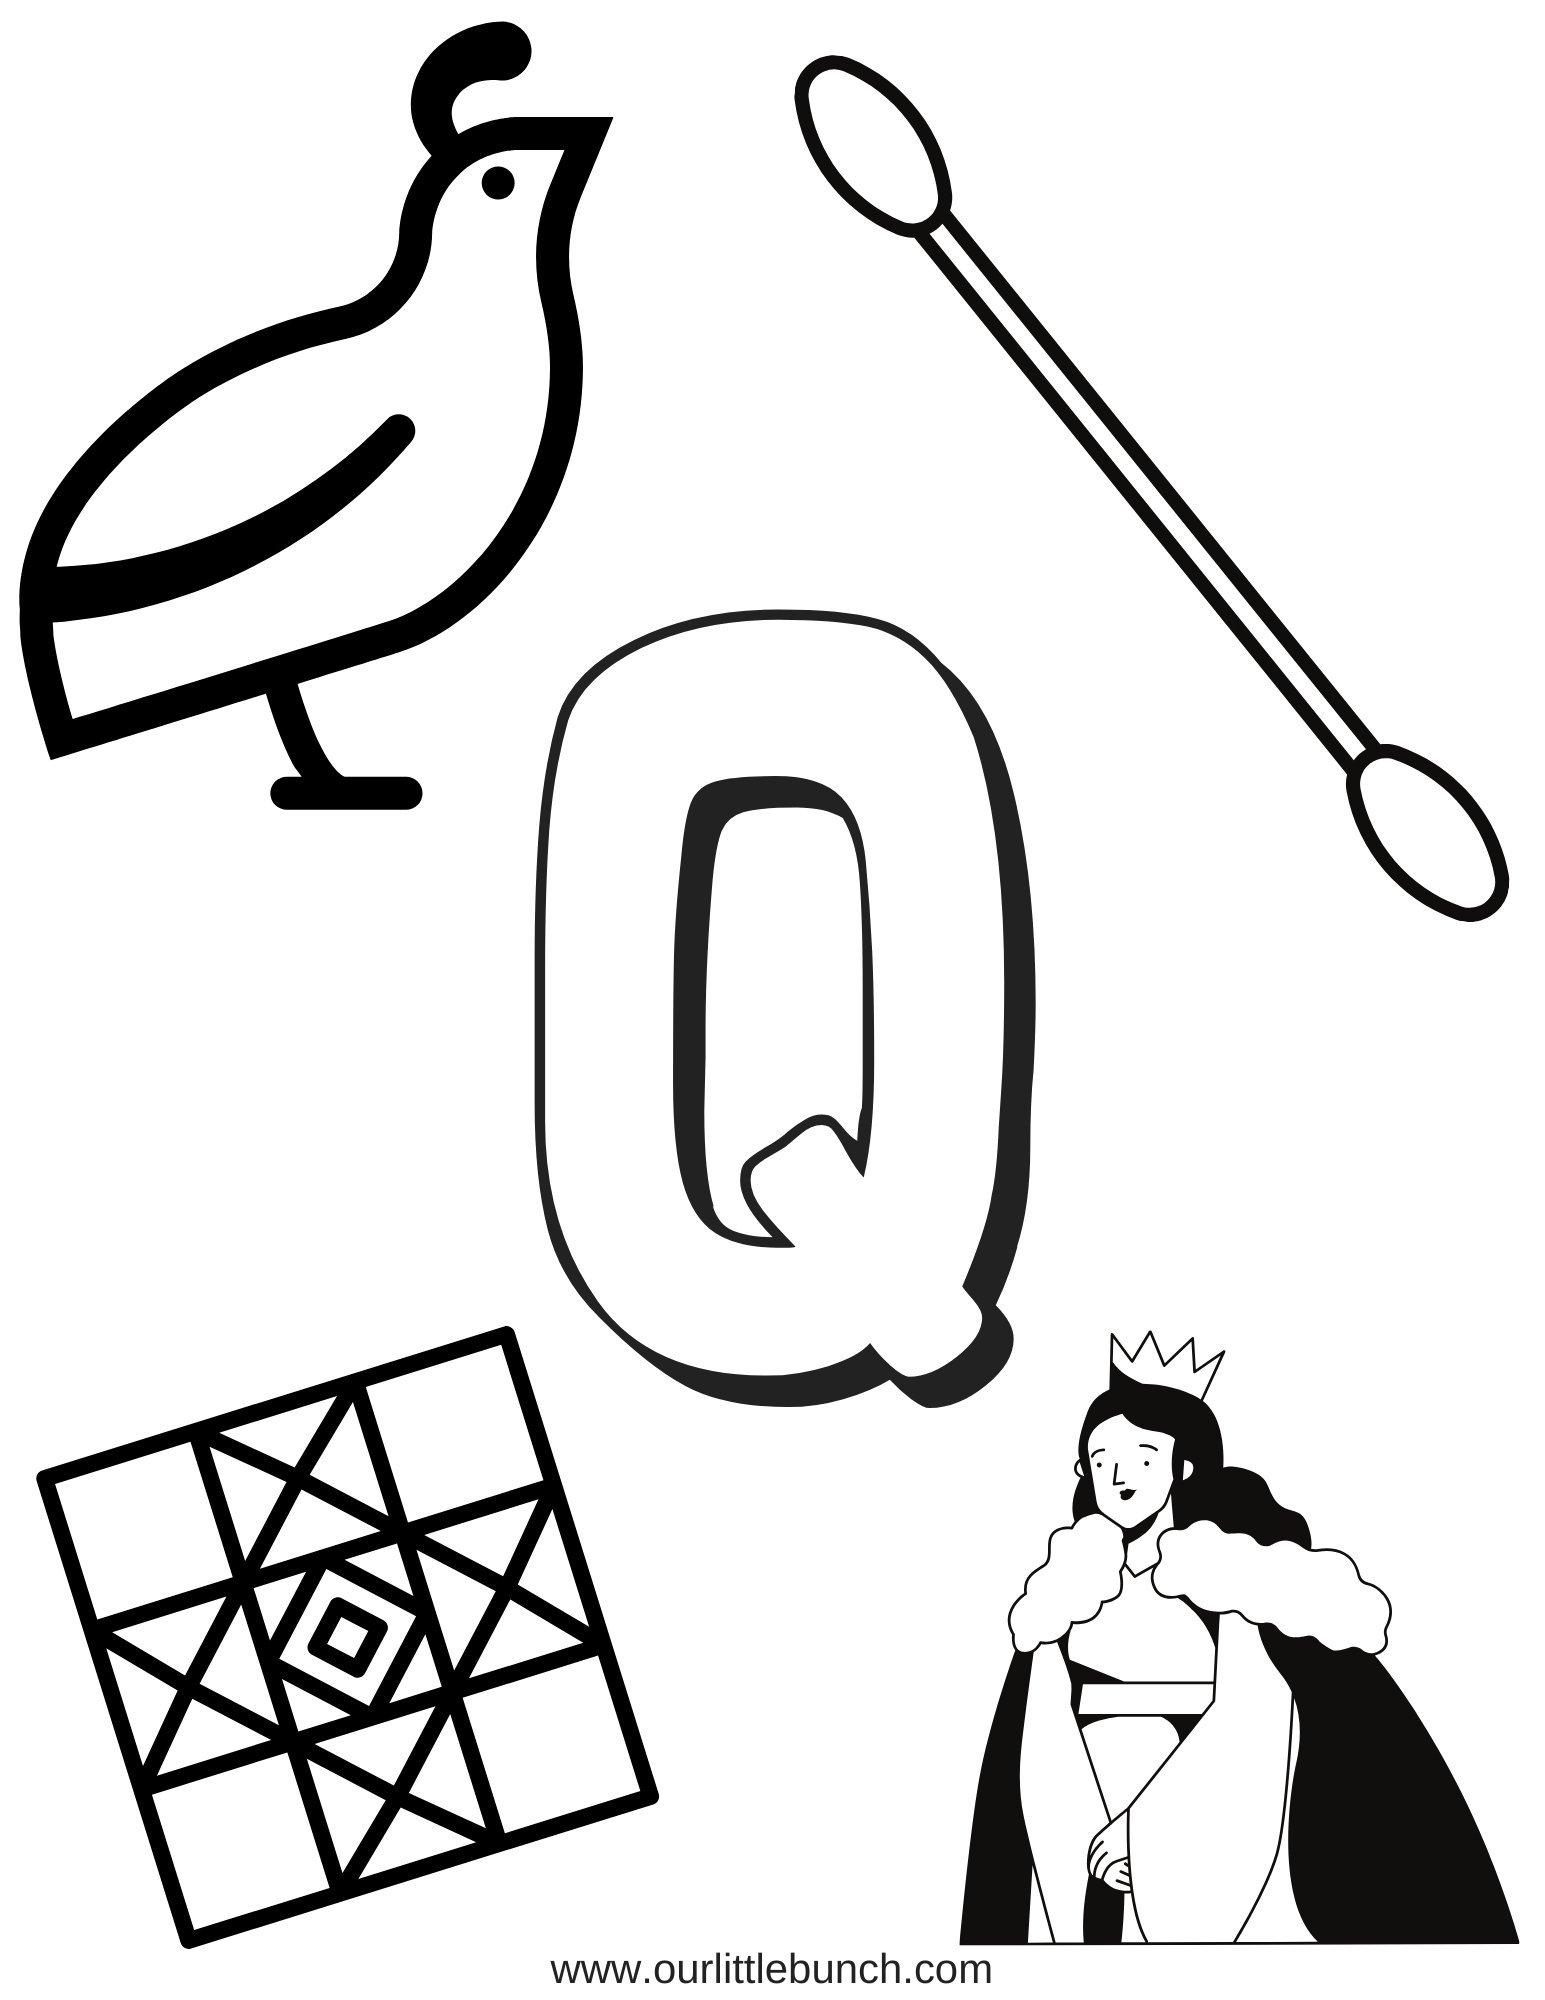 Letter Q Pintable 2